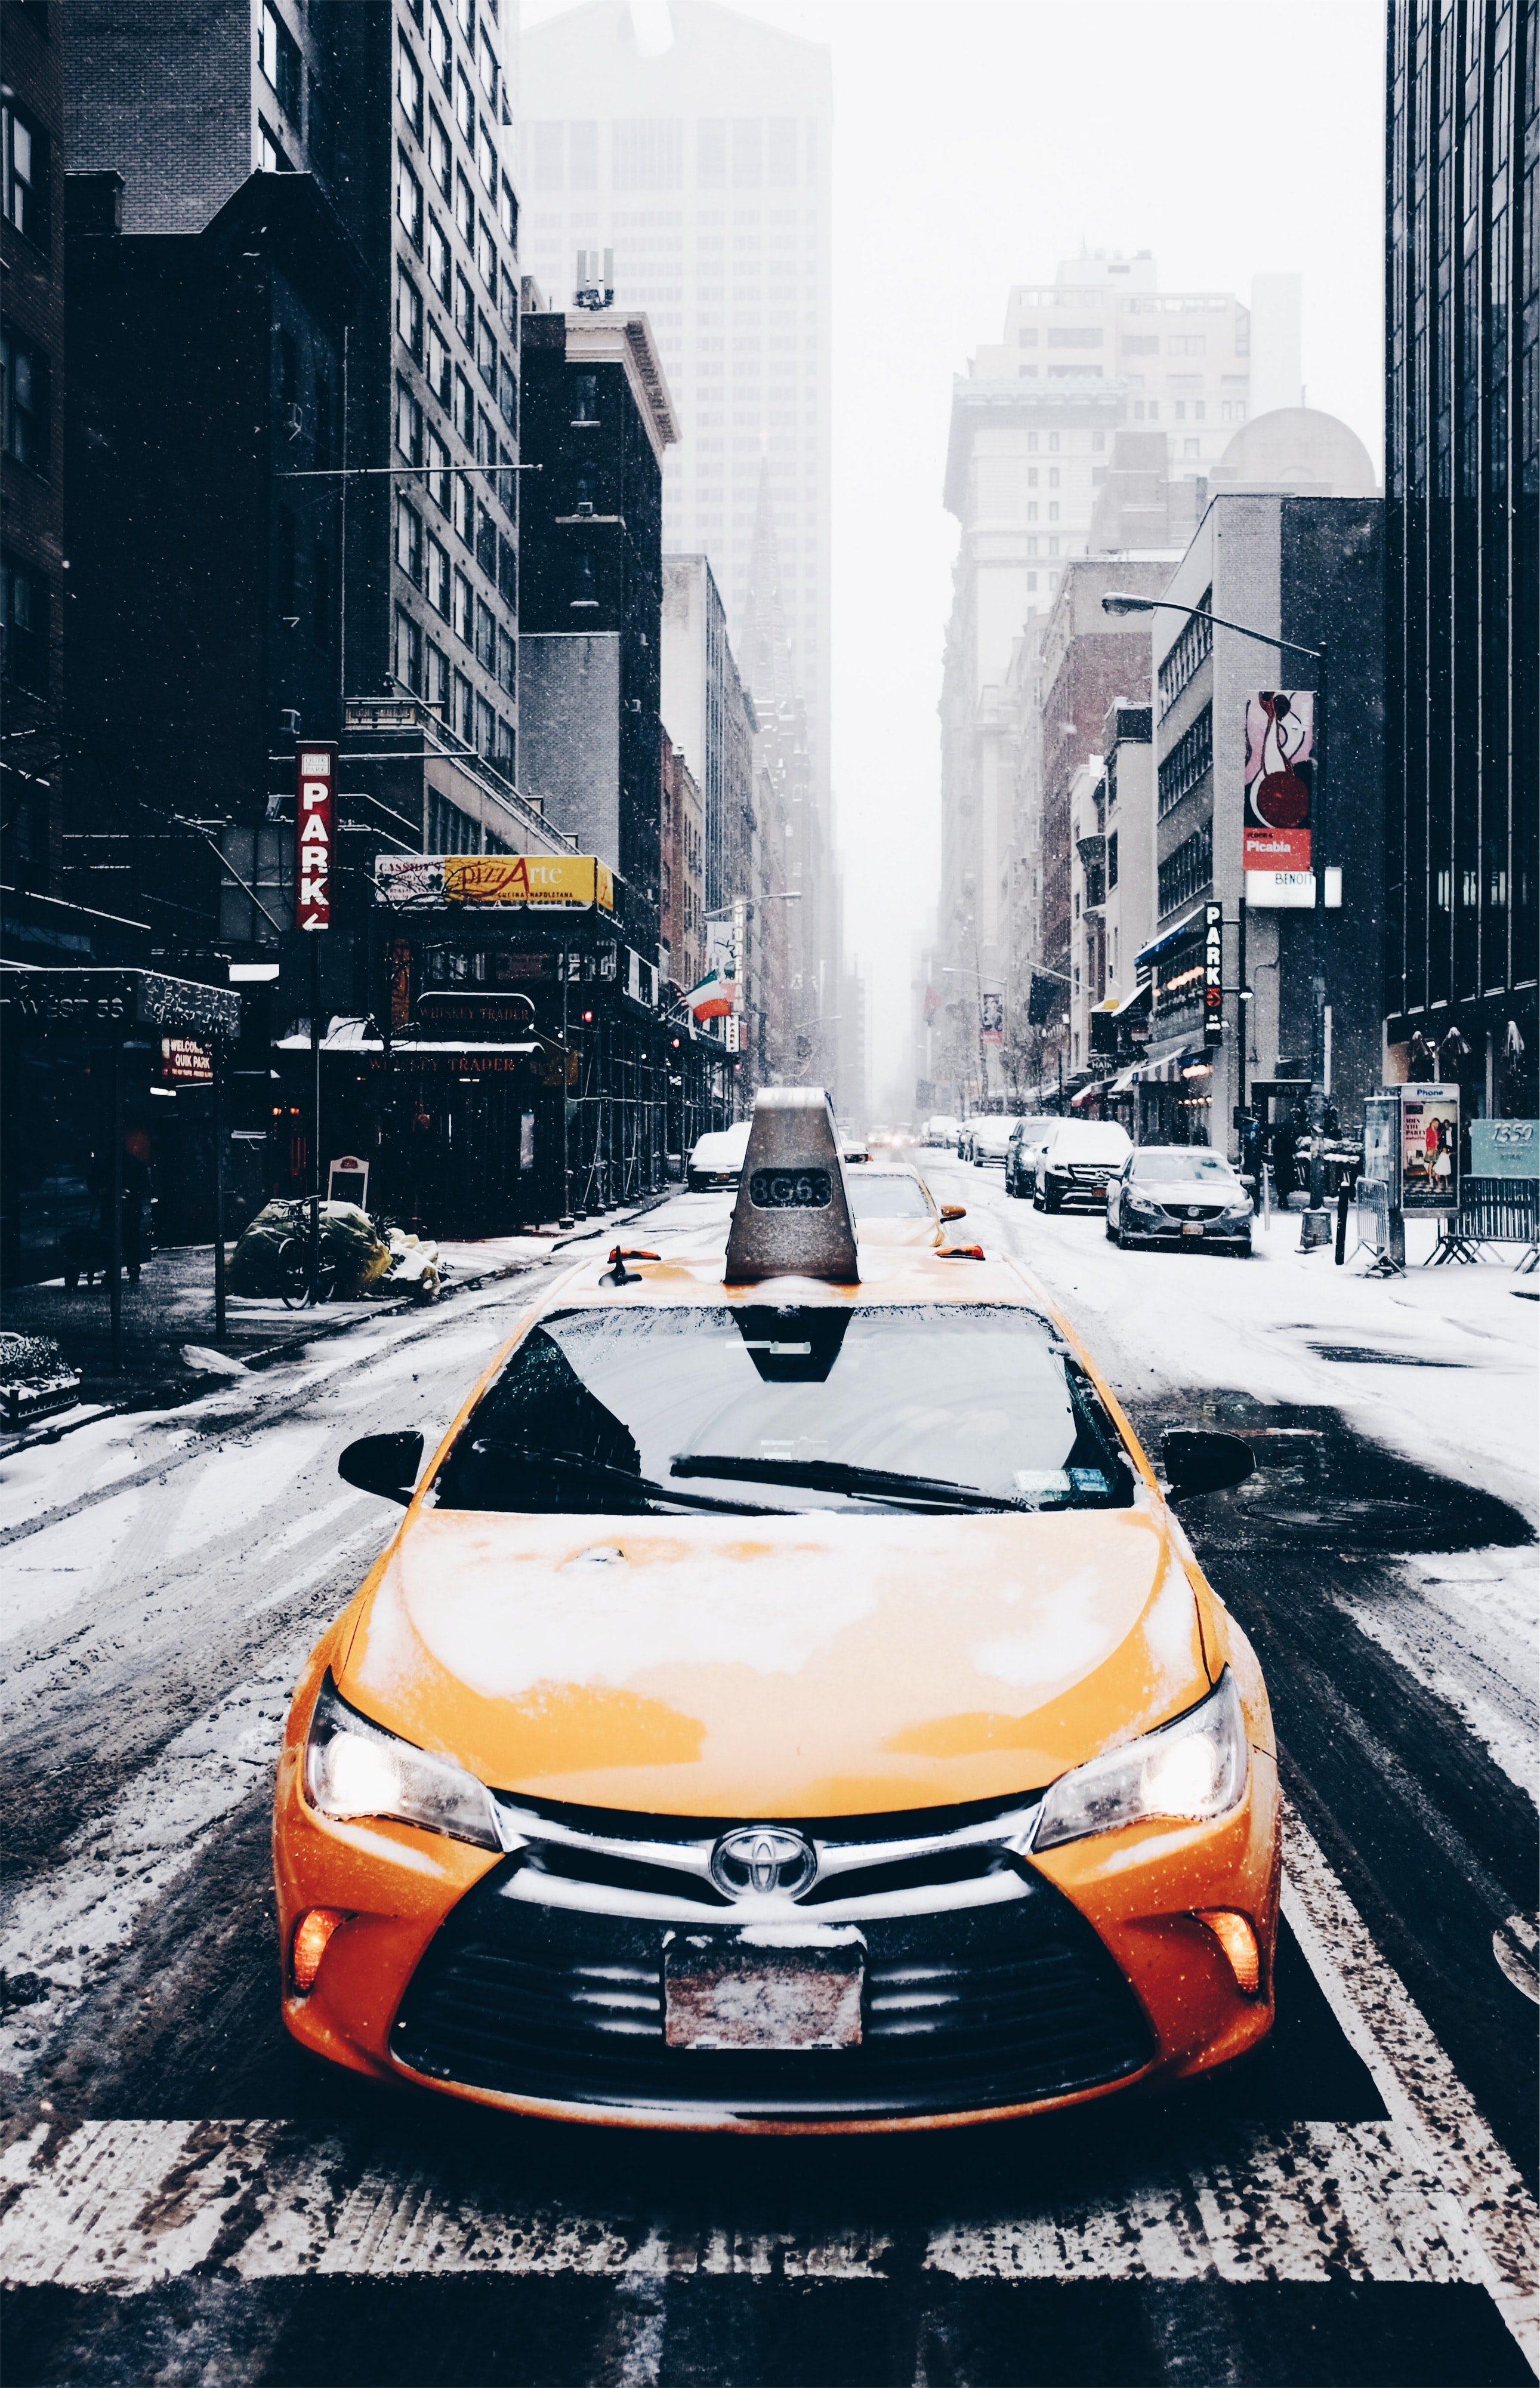 orange Toyota car on road near buildings